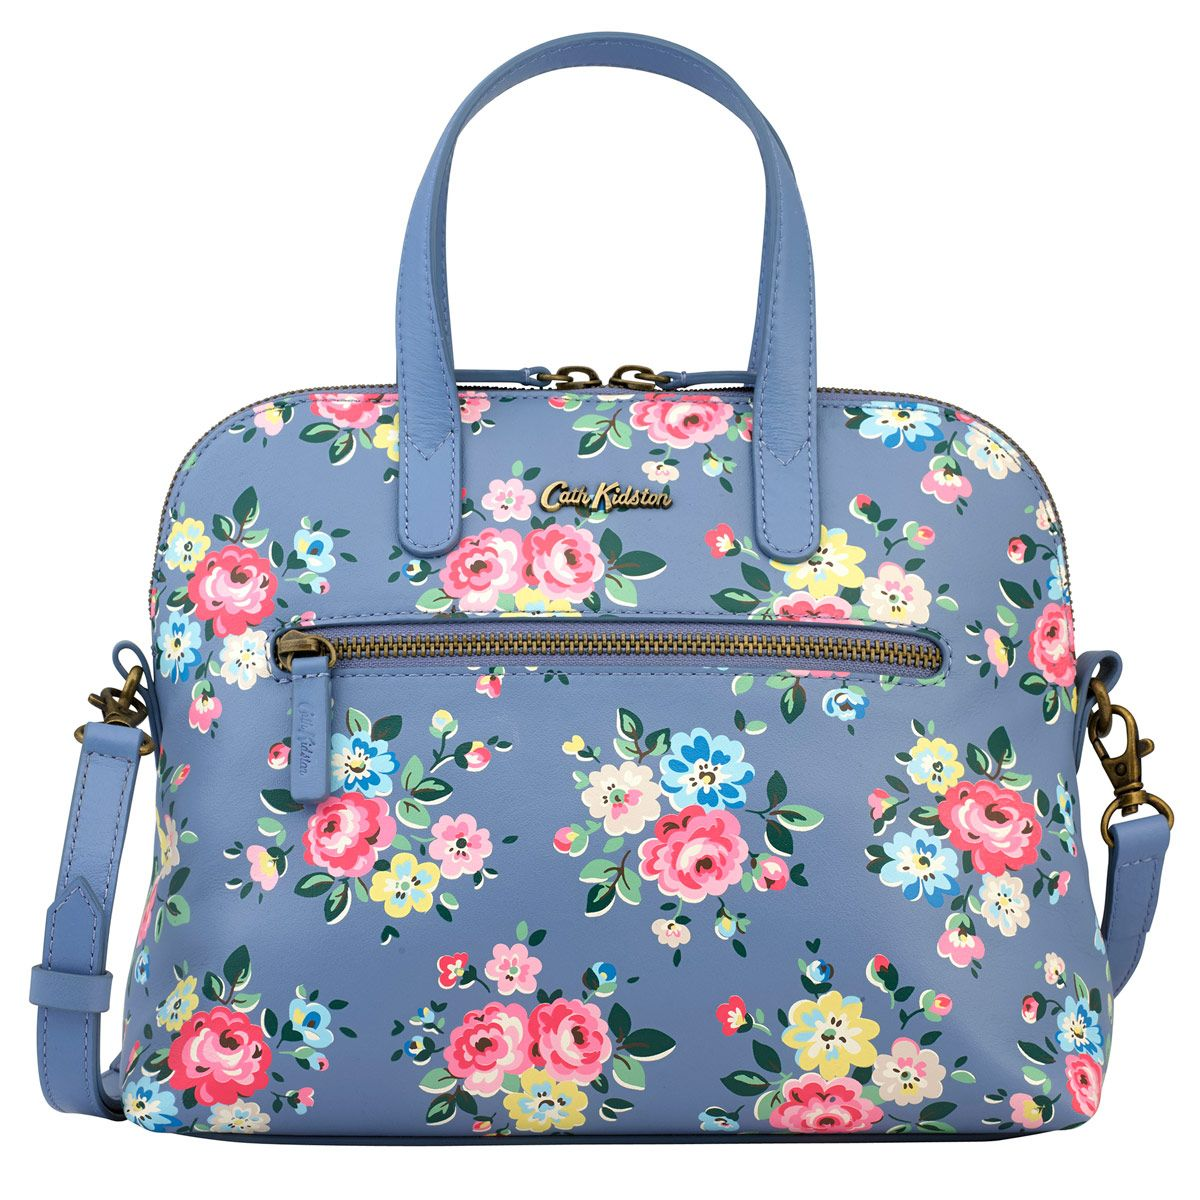 Rose Printed Mini Leather Handbag